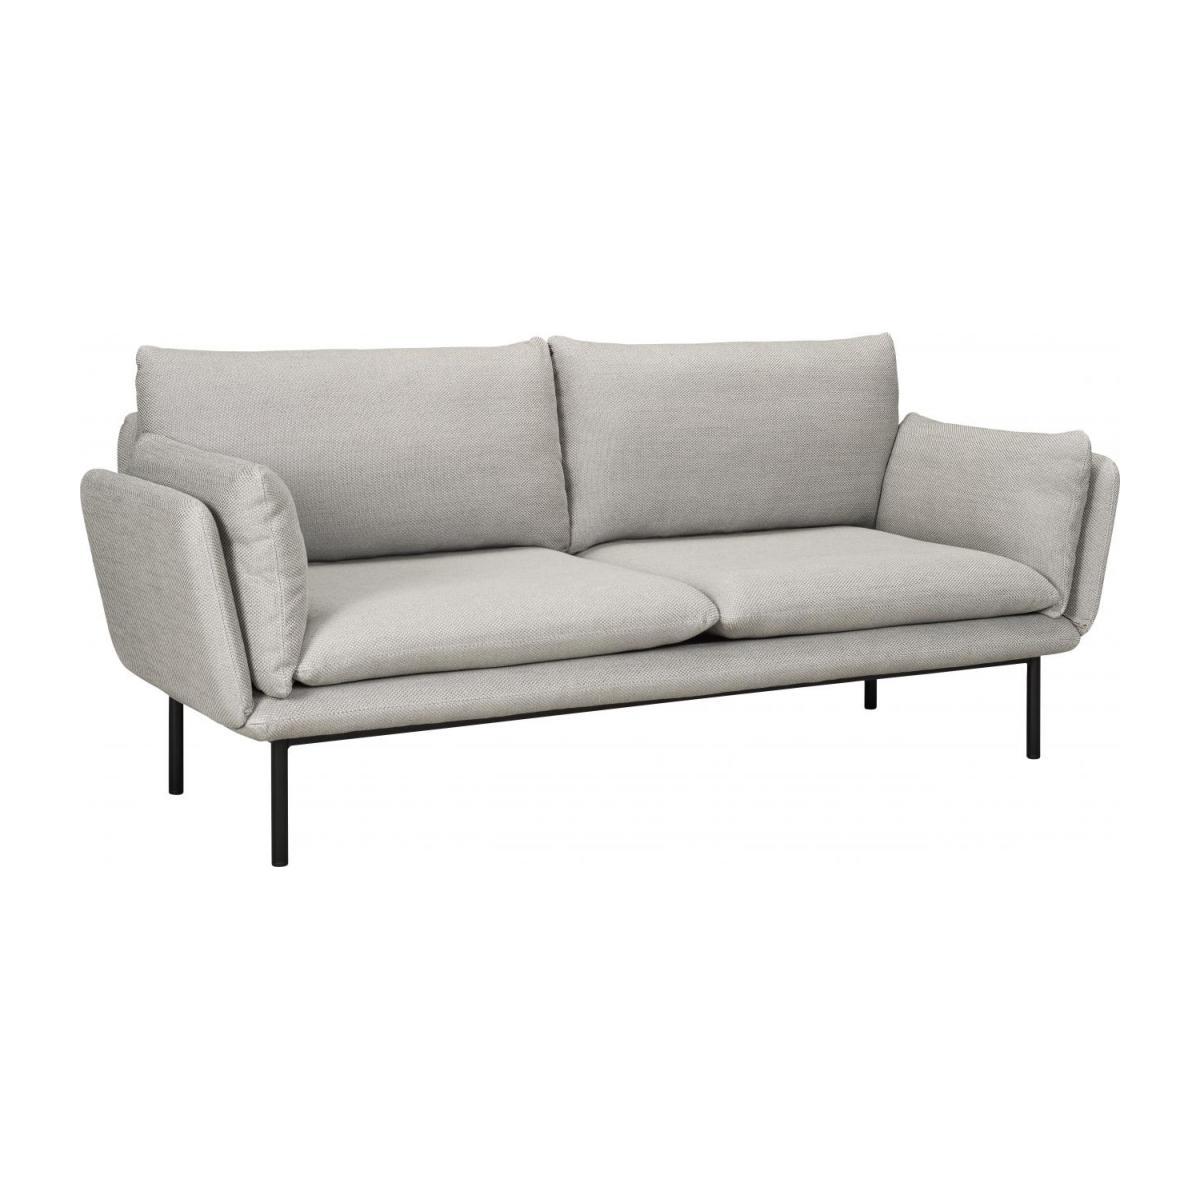 Full Size of Sofa 3 Sitzer Leder Grau Couch 2 Und Retro Kingsley 3 Sitzer Samt Louisiana (3 Sitzer Mit Polster Grau) Riva Aus Stoff Verstellbarer Sitztiefe Regal Sofa Sofa 3 Sitzer Grau